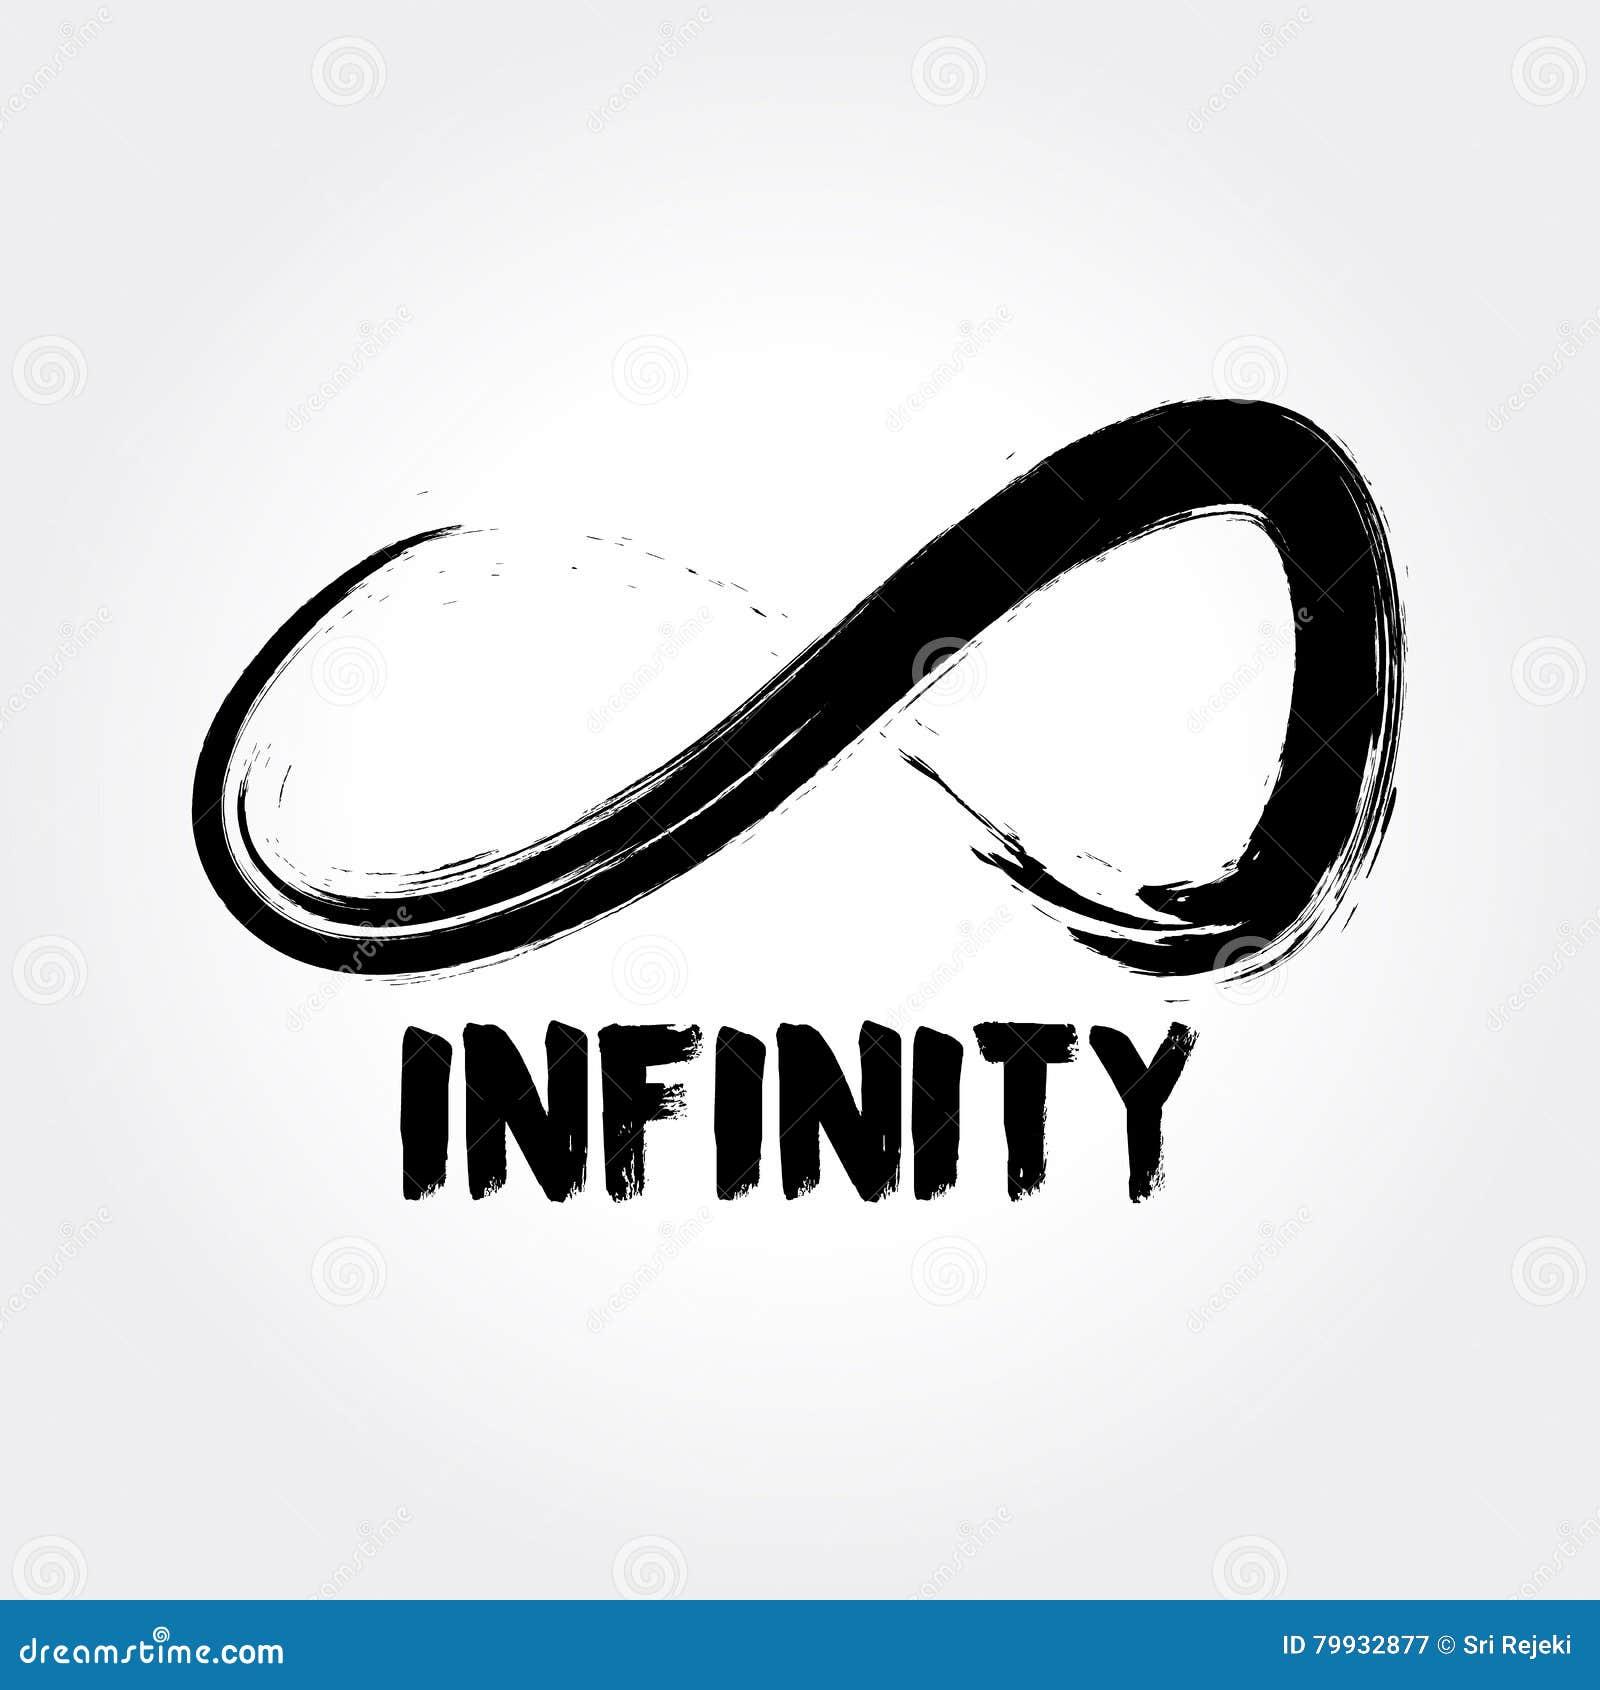 Logo infinity symbol images symbol and sign ideas infinity symbol hand drawn logo concept stock vector infinity symbol hand drawn logo concept doodle background buycottarizona